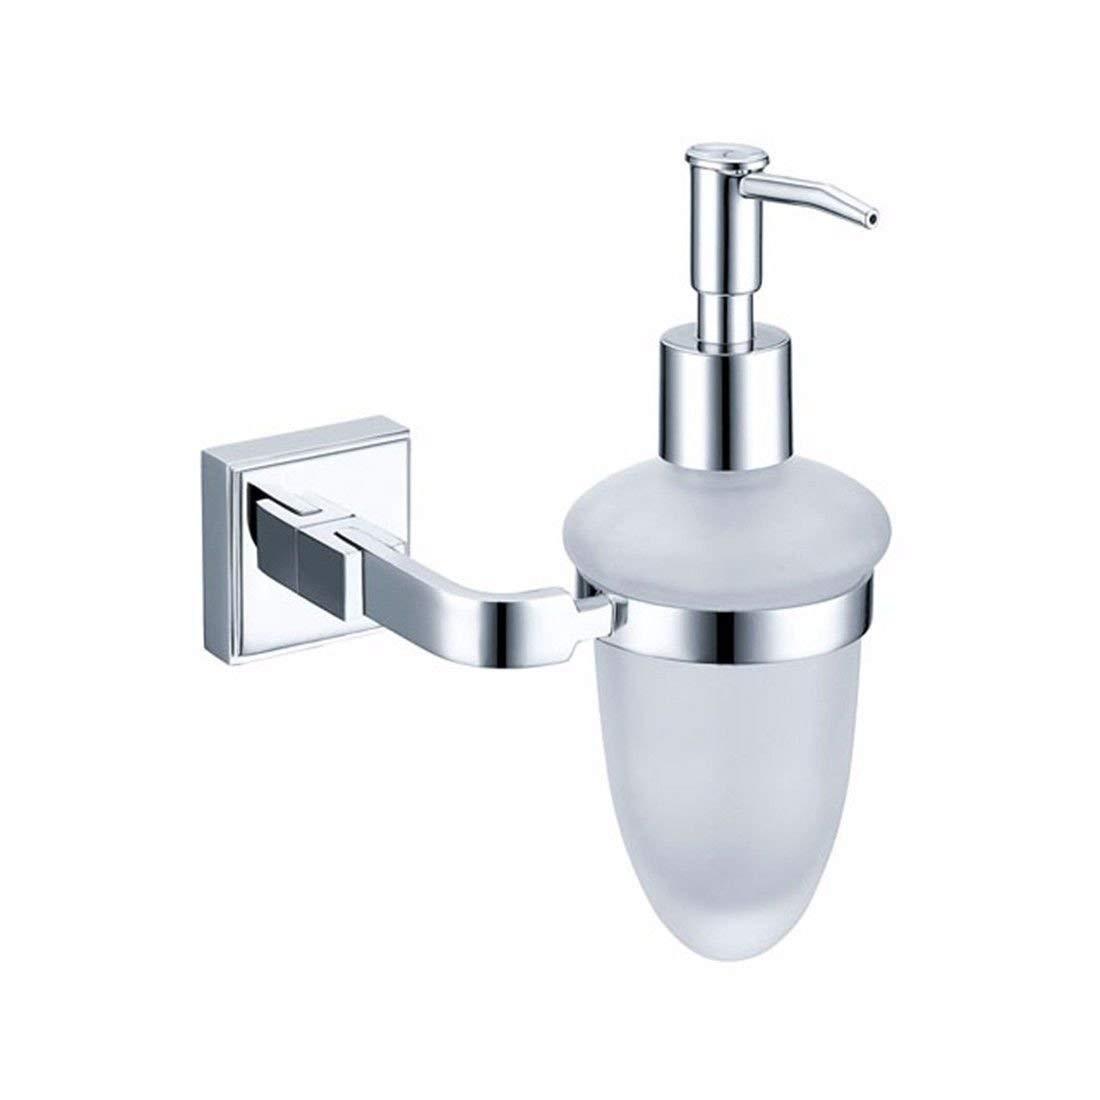 Goodscene Liquid Soap Dispenser AiRobin-Contemporary Brass Chrome Plated Square Base Lotion Dispenser Bathroom Accessory (Color : Lotion Dispenser)